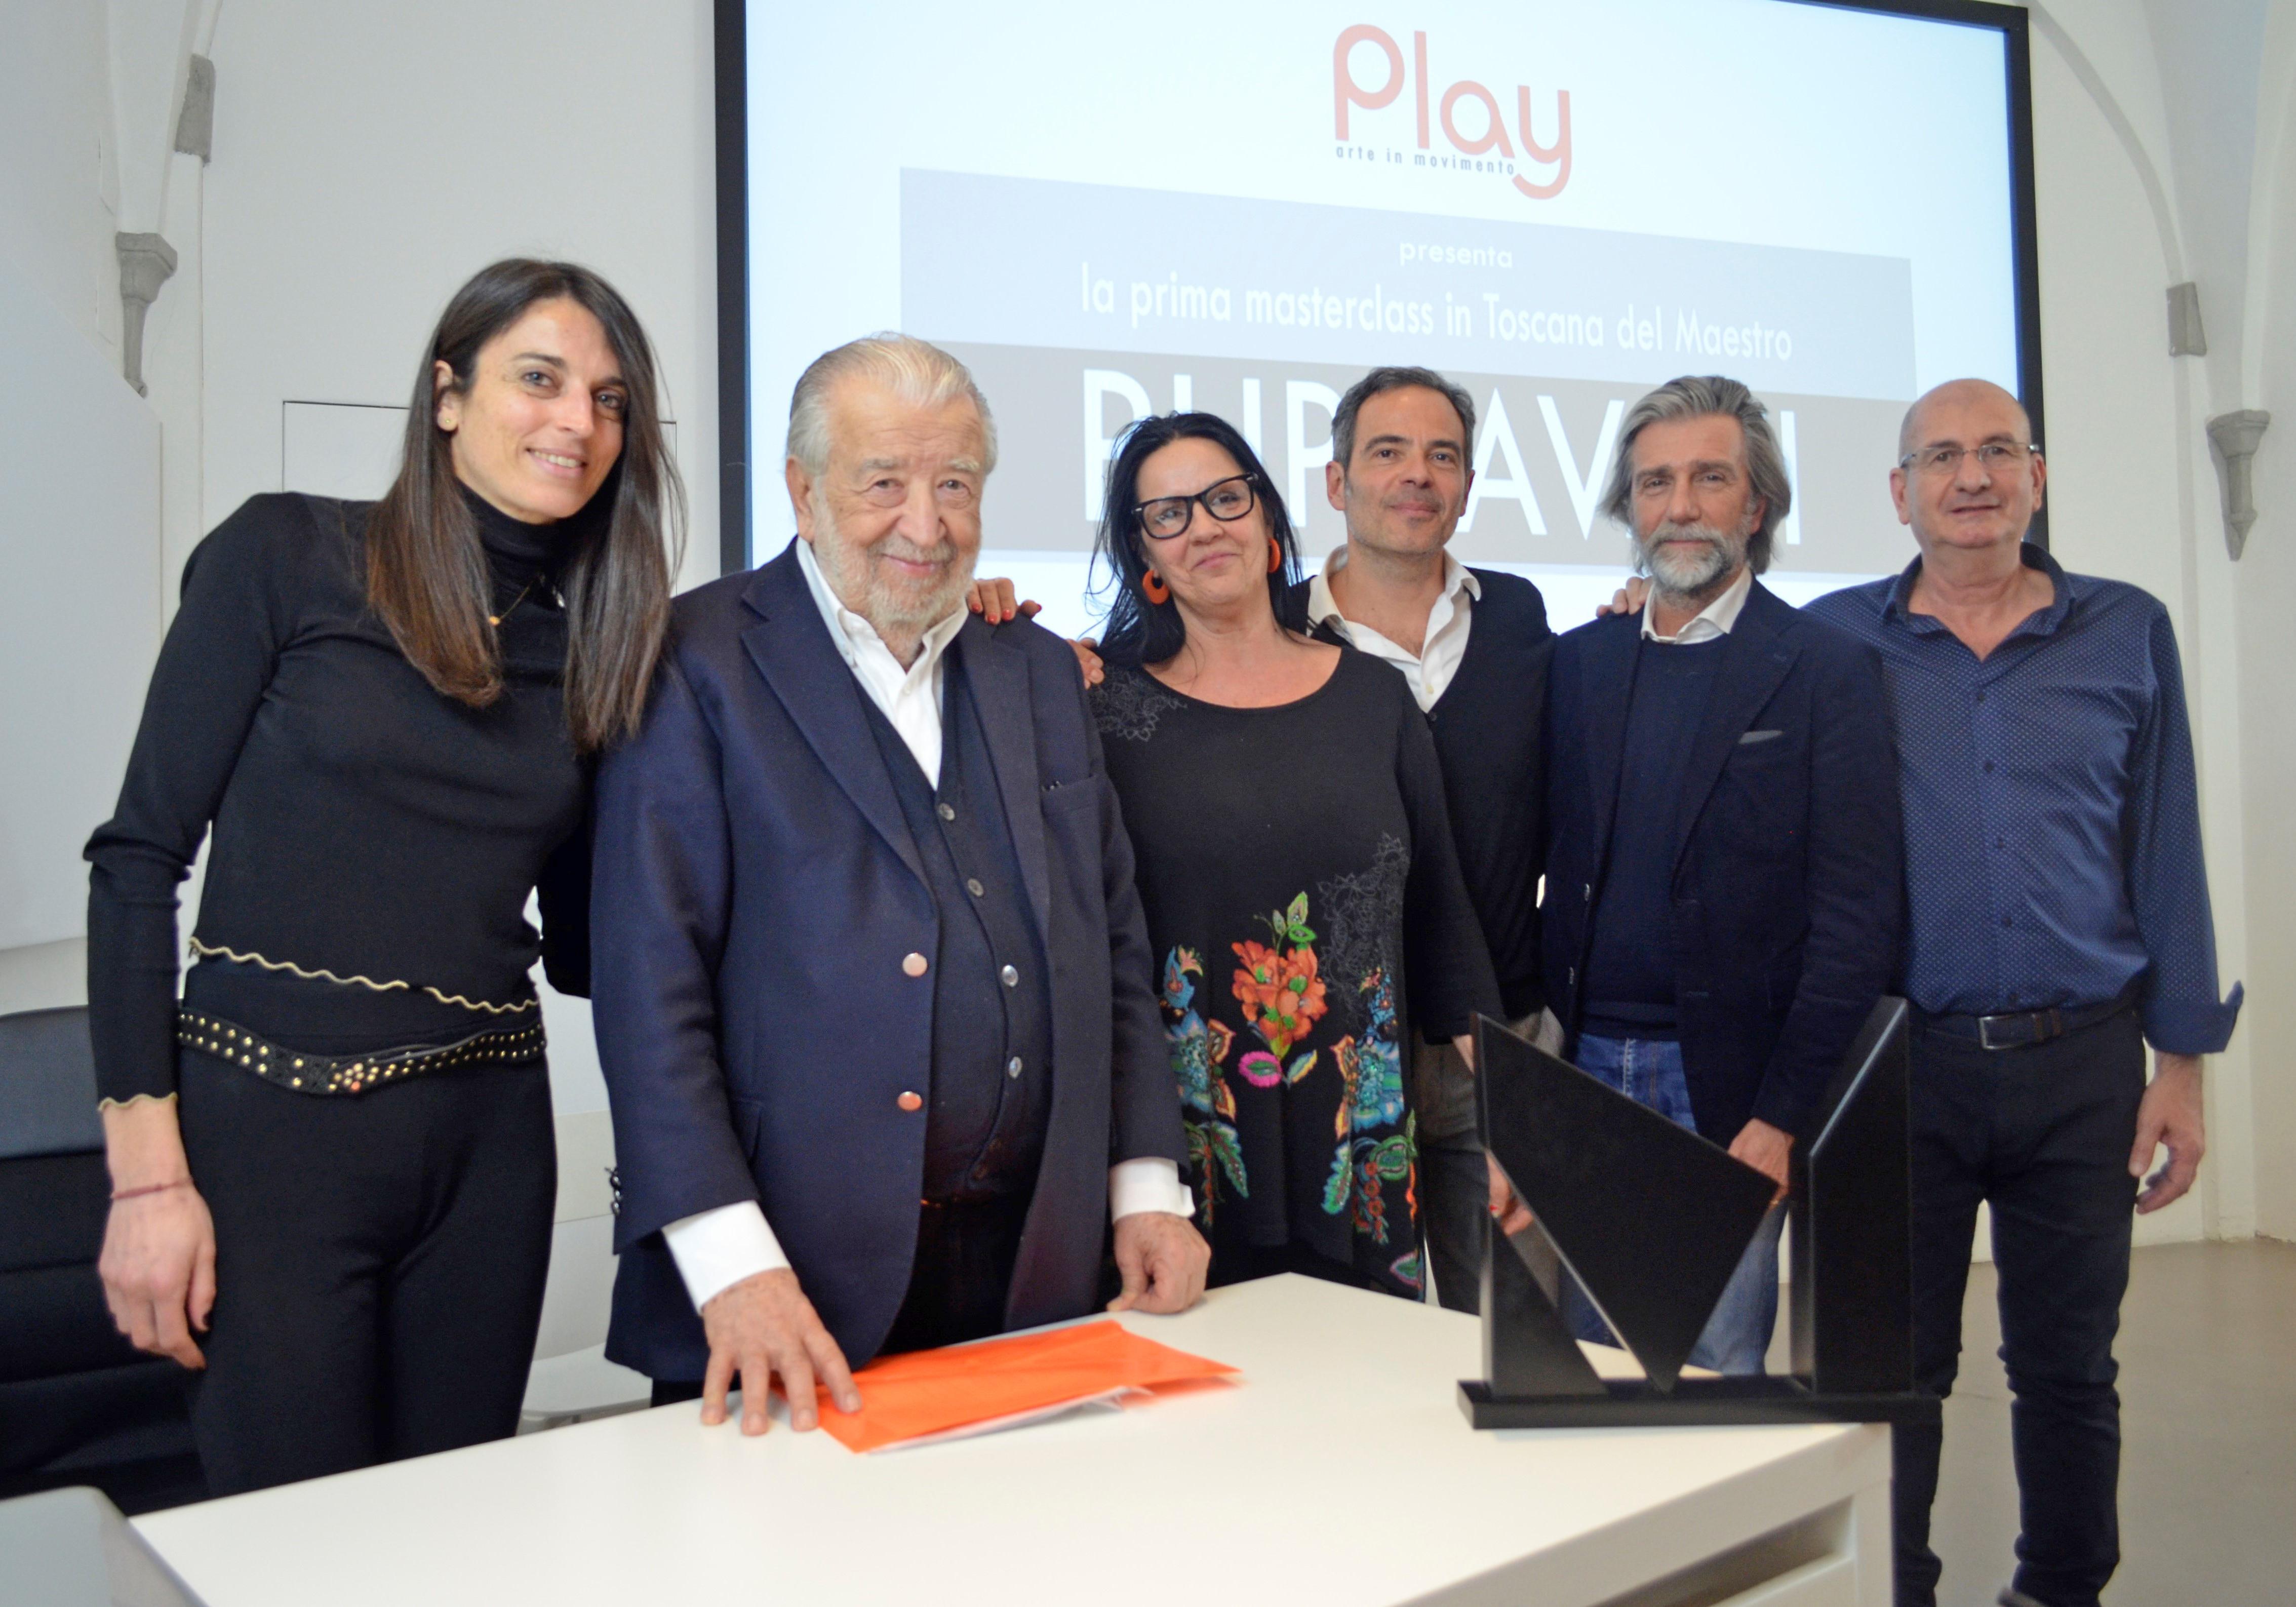 Pupi Avati a Manifatture Digitali Cinema Prato